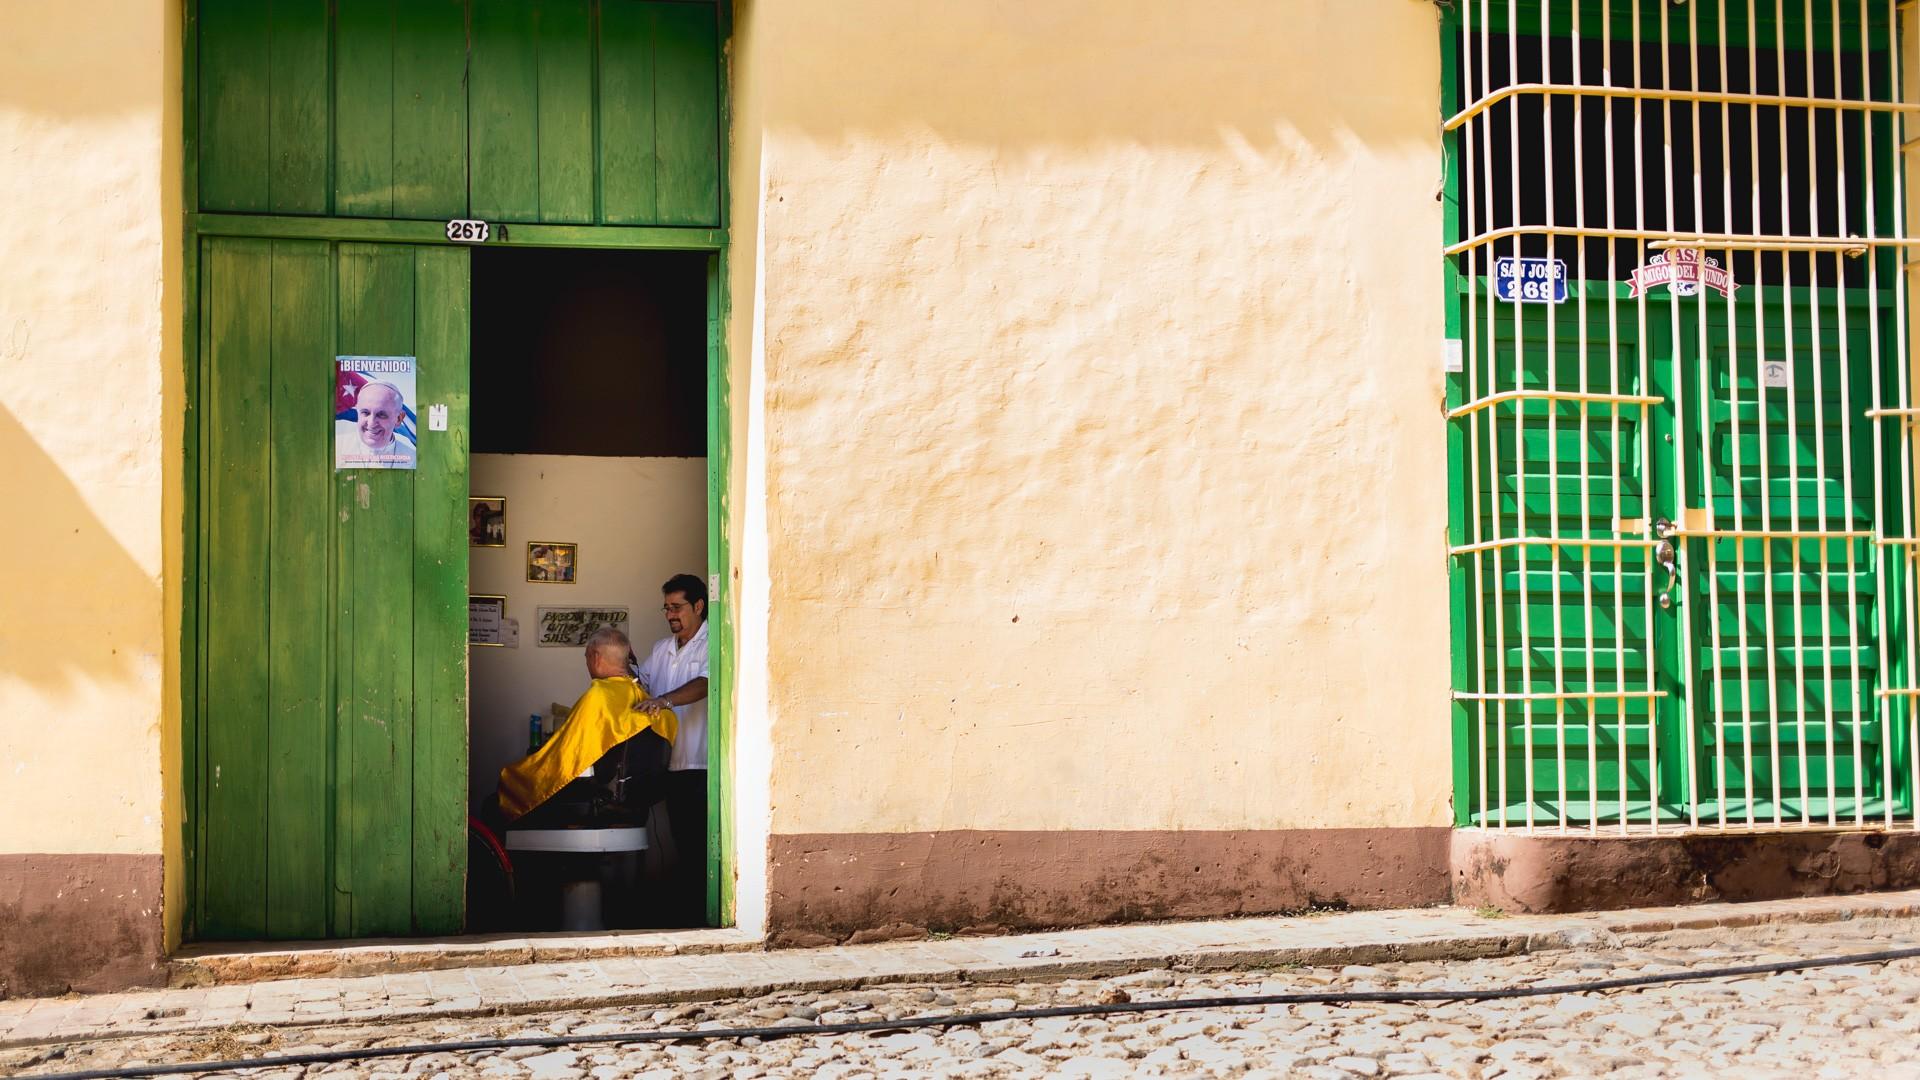 Damien-Dohmen-Photographe-Cuba-32